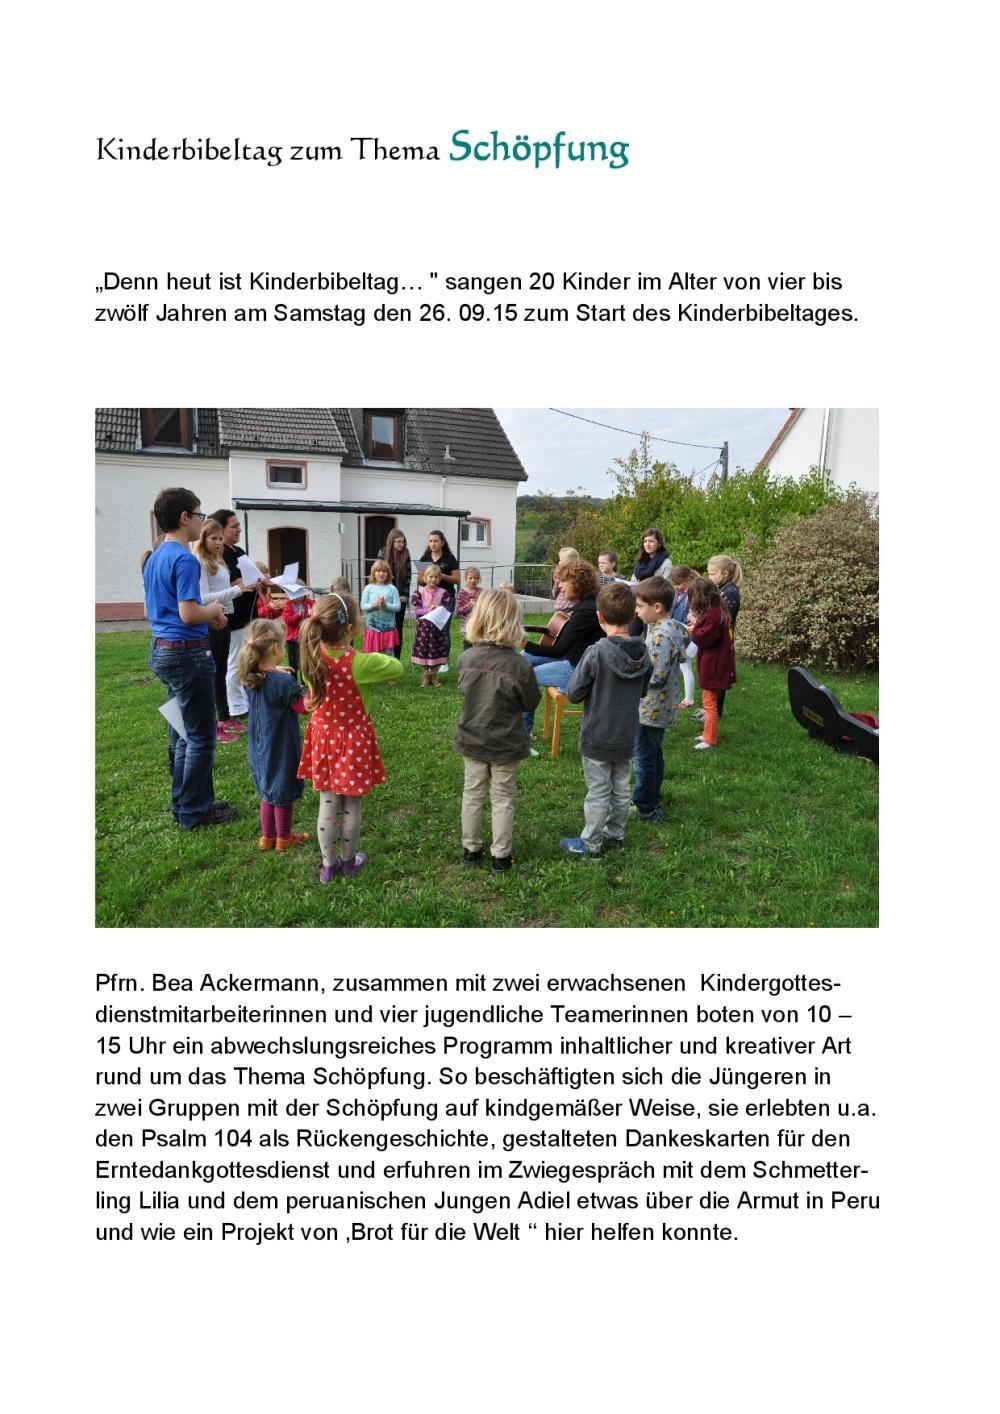 2015-09-26 Kinderbibeltag-001